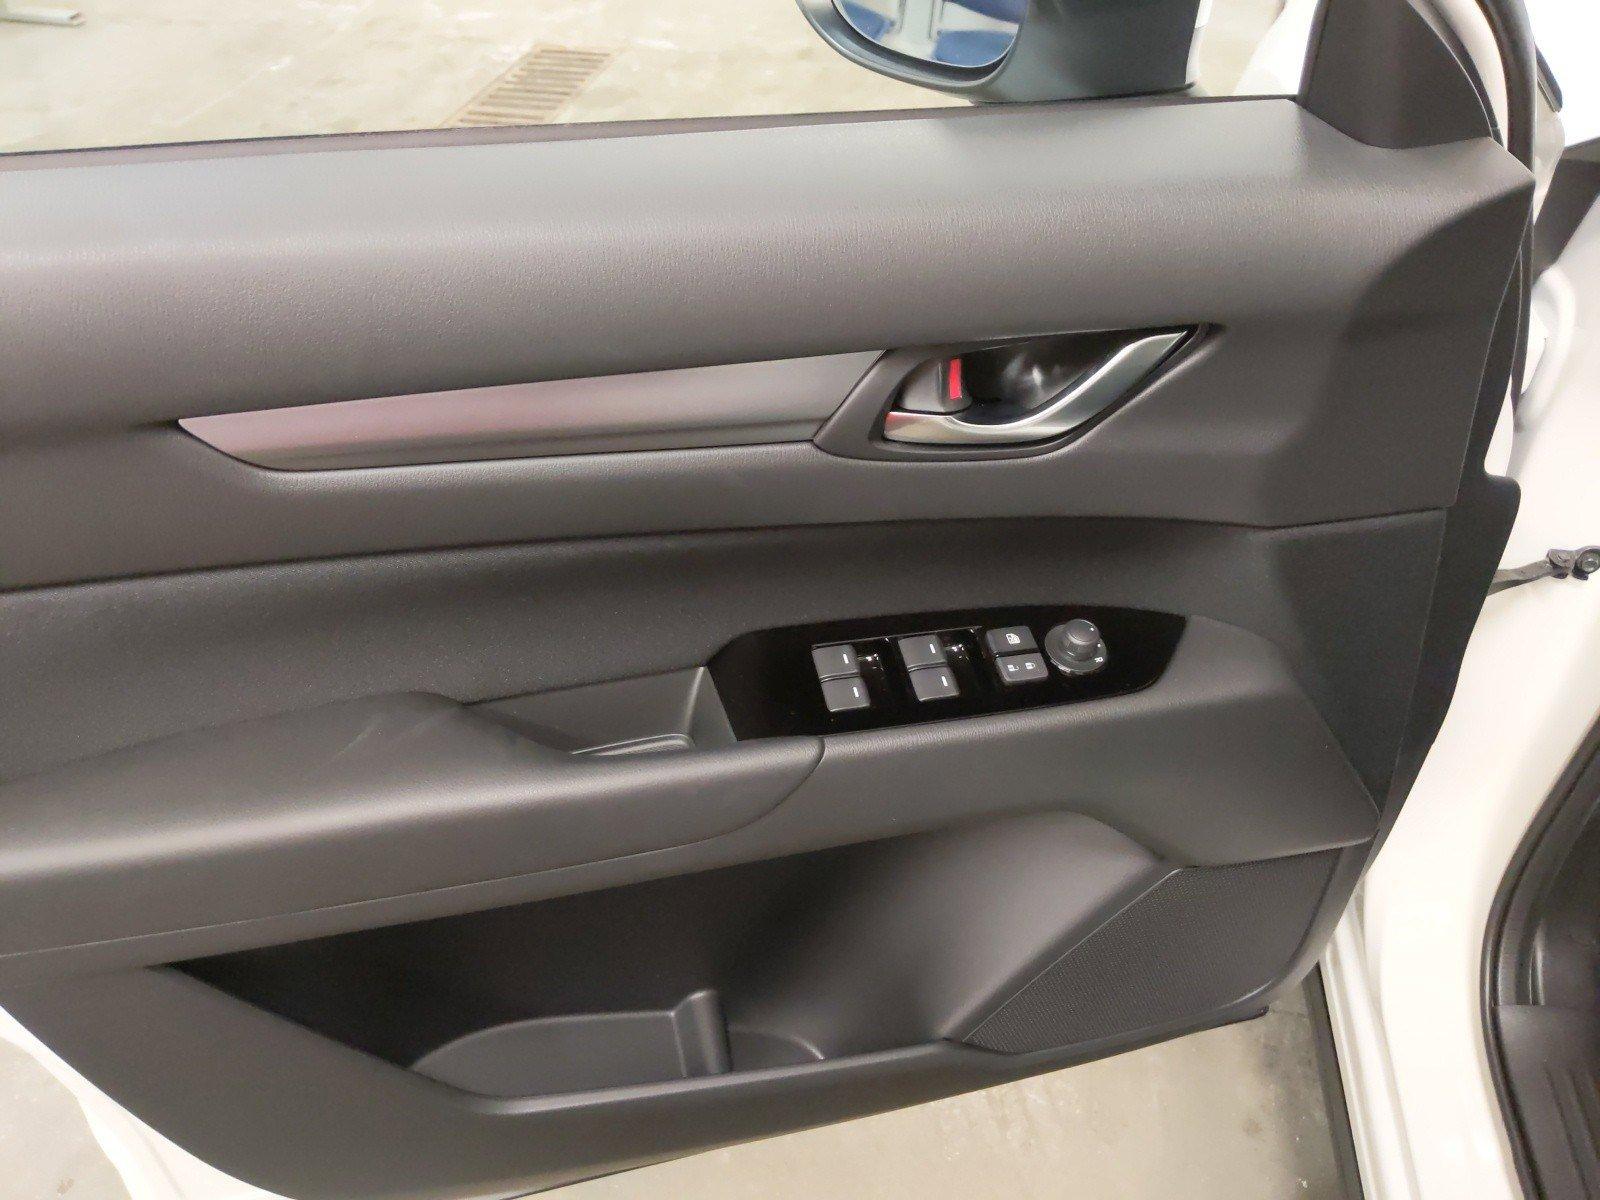 New 2020 Mazda Cx-5 Sport Sport Utility for sale in Lincoln NE